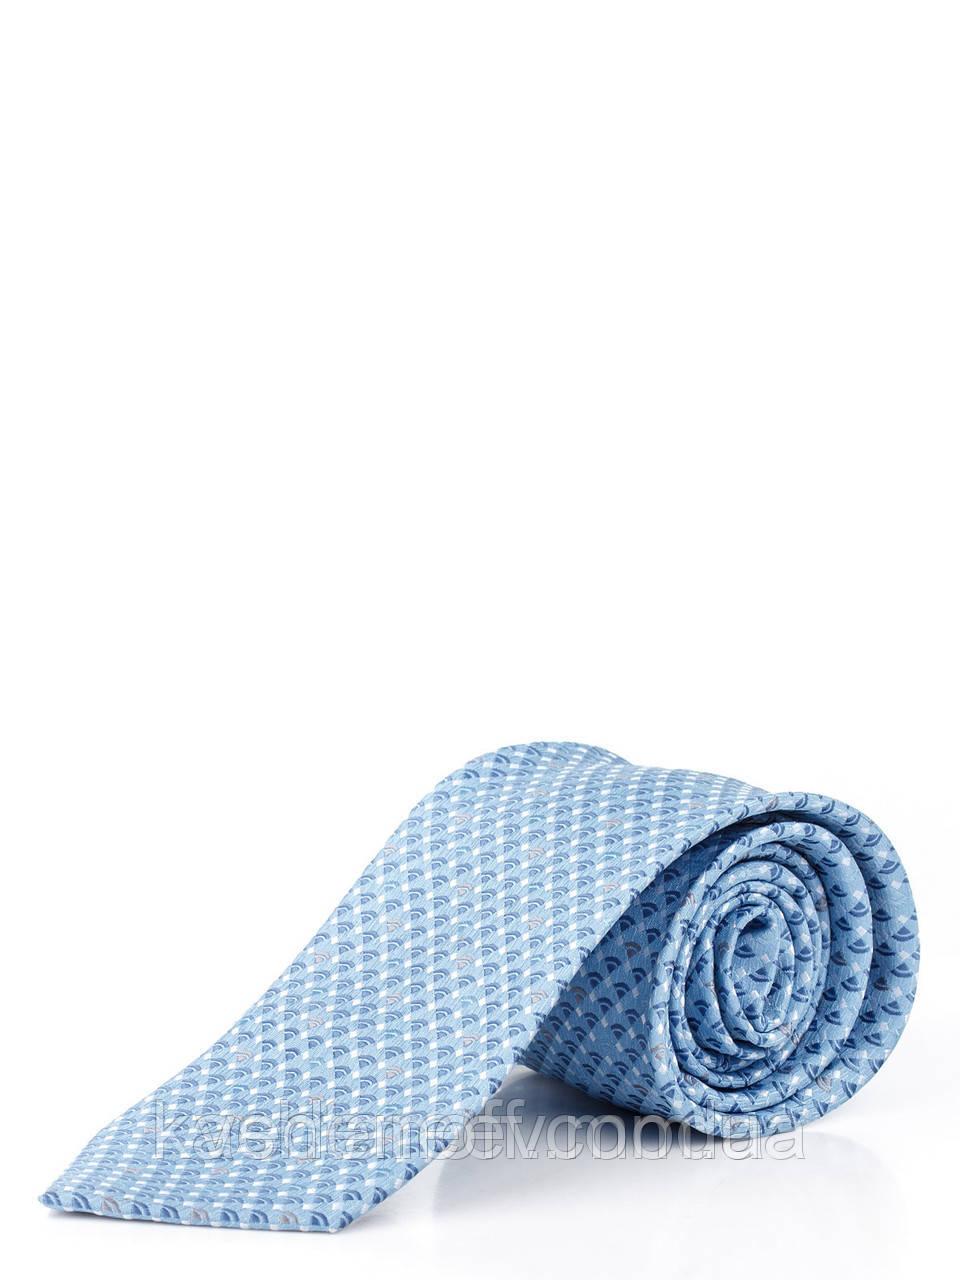 Краватка блакитна в діагональну луску